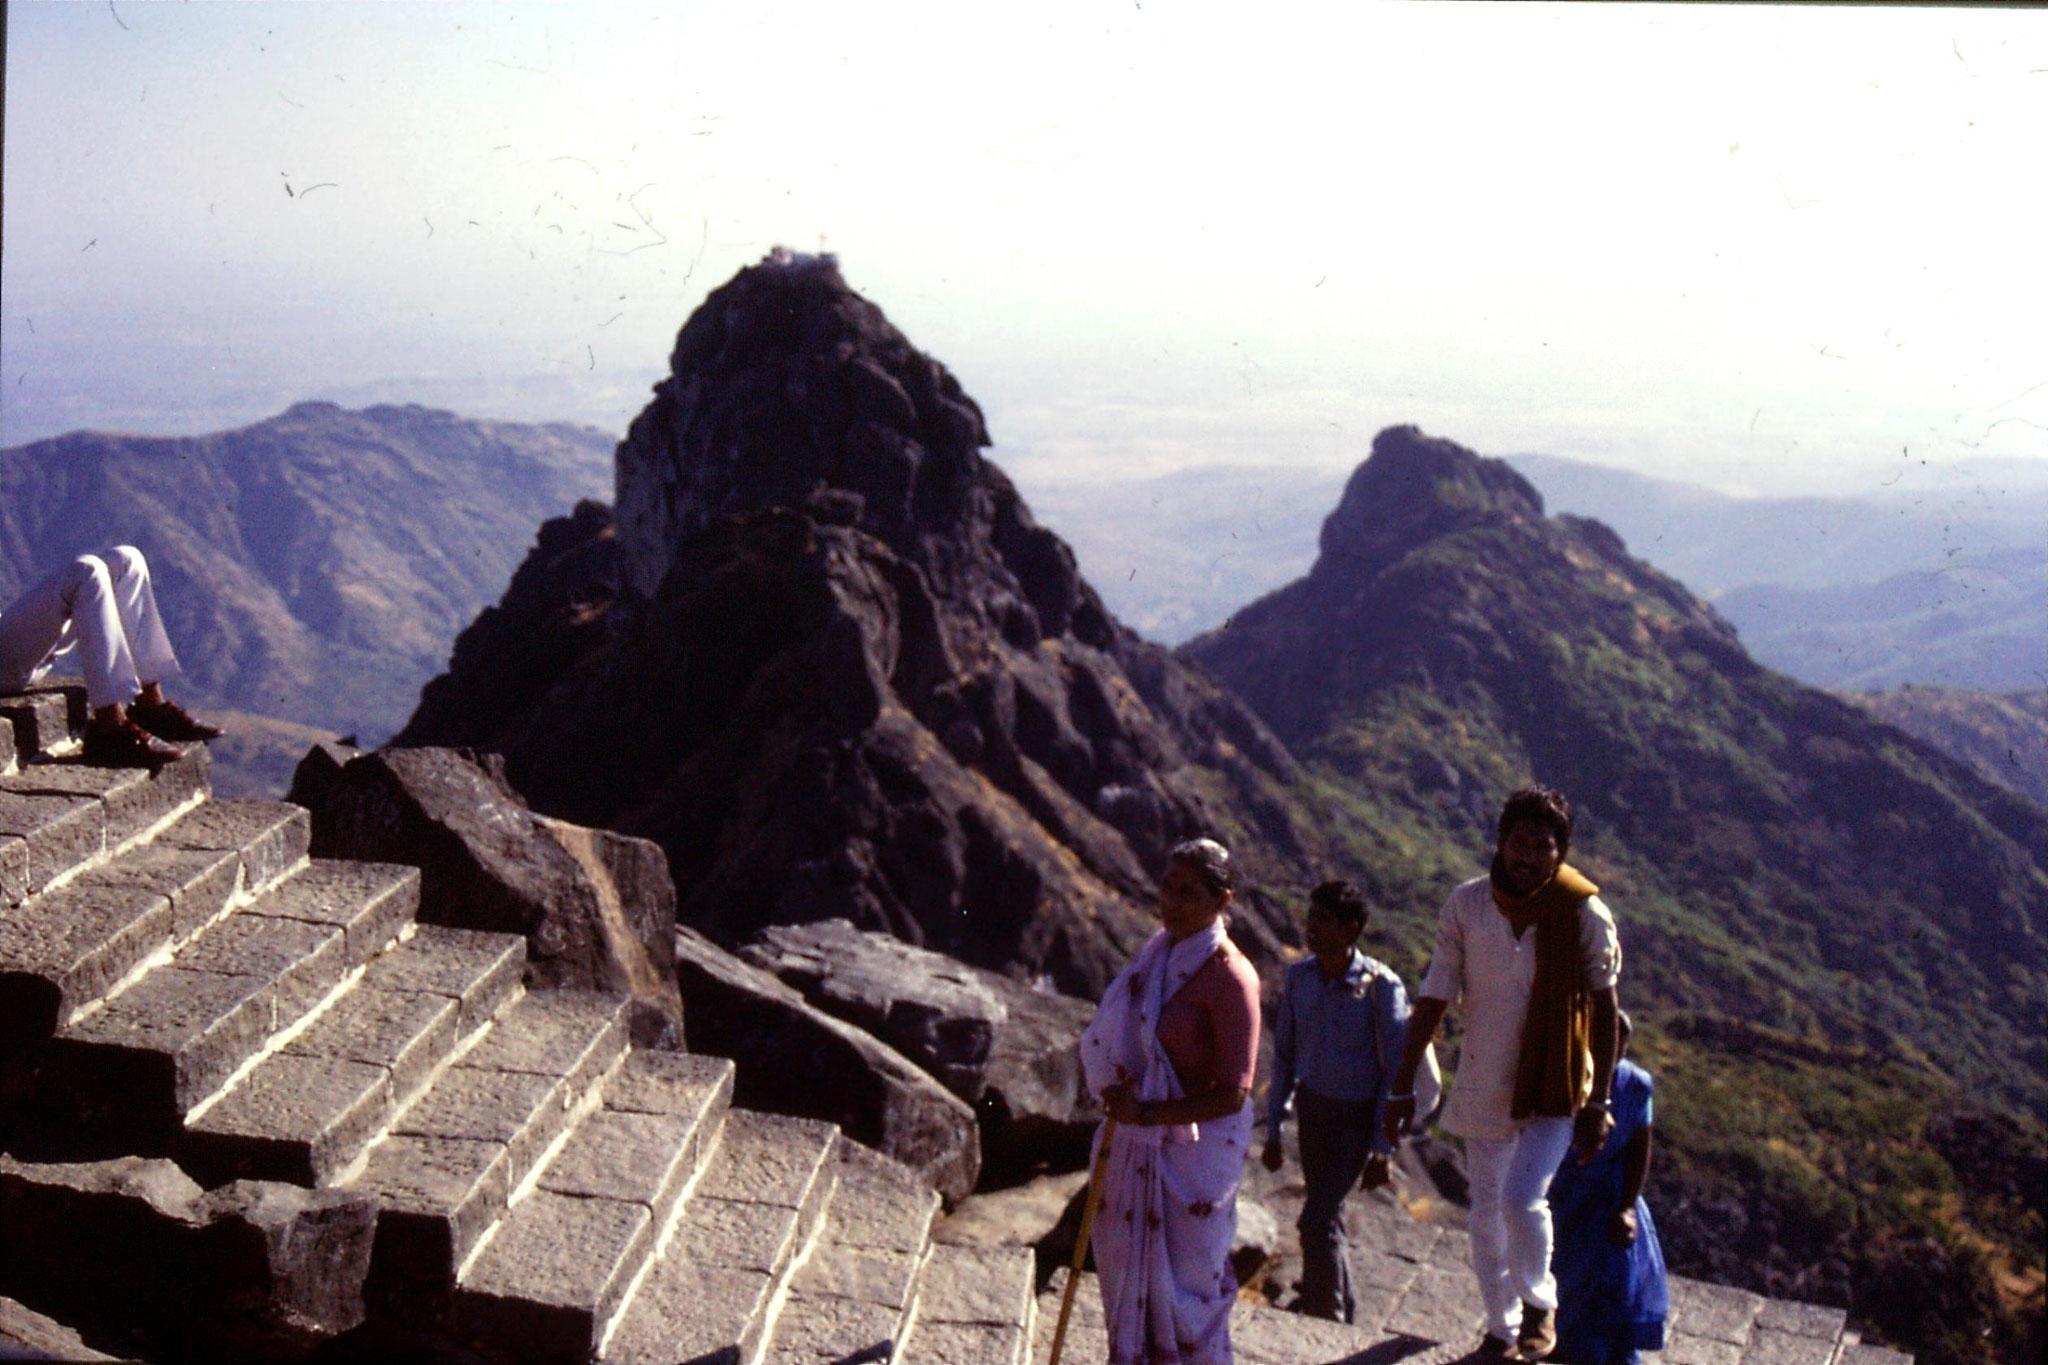 12/12/1989: 0: Junagardh, top of Mt Girnar